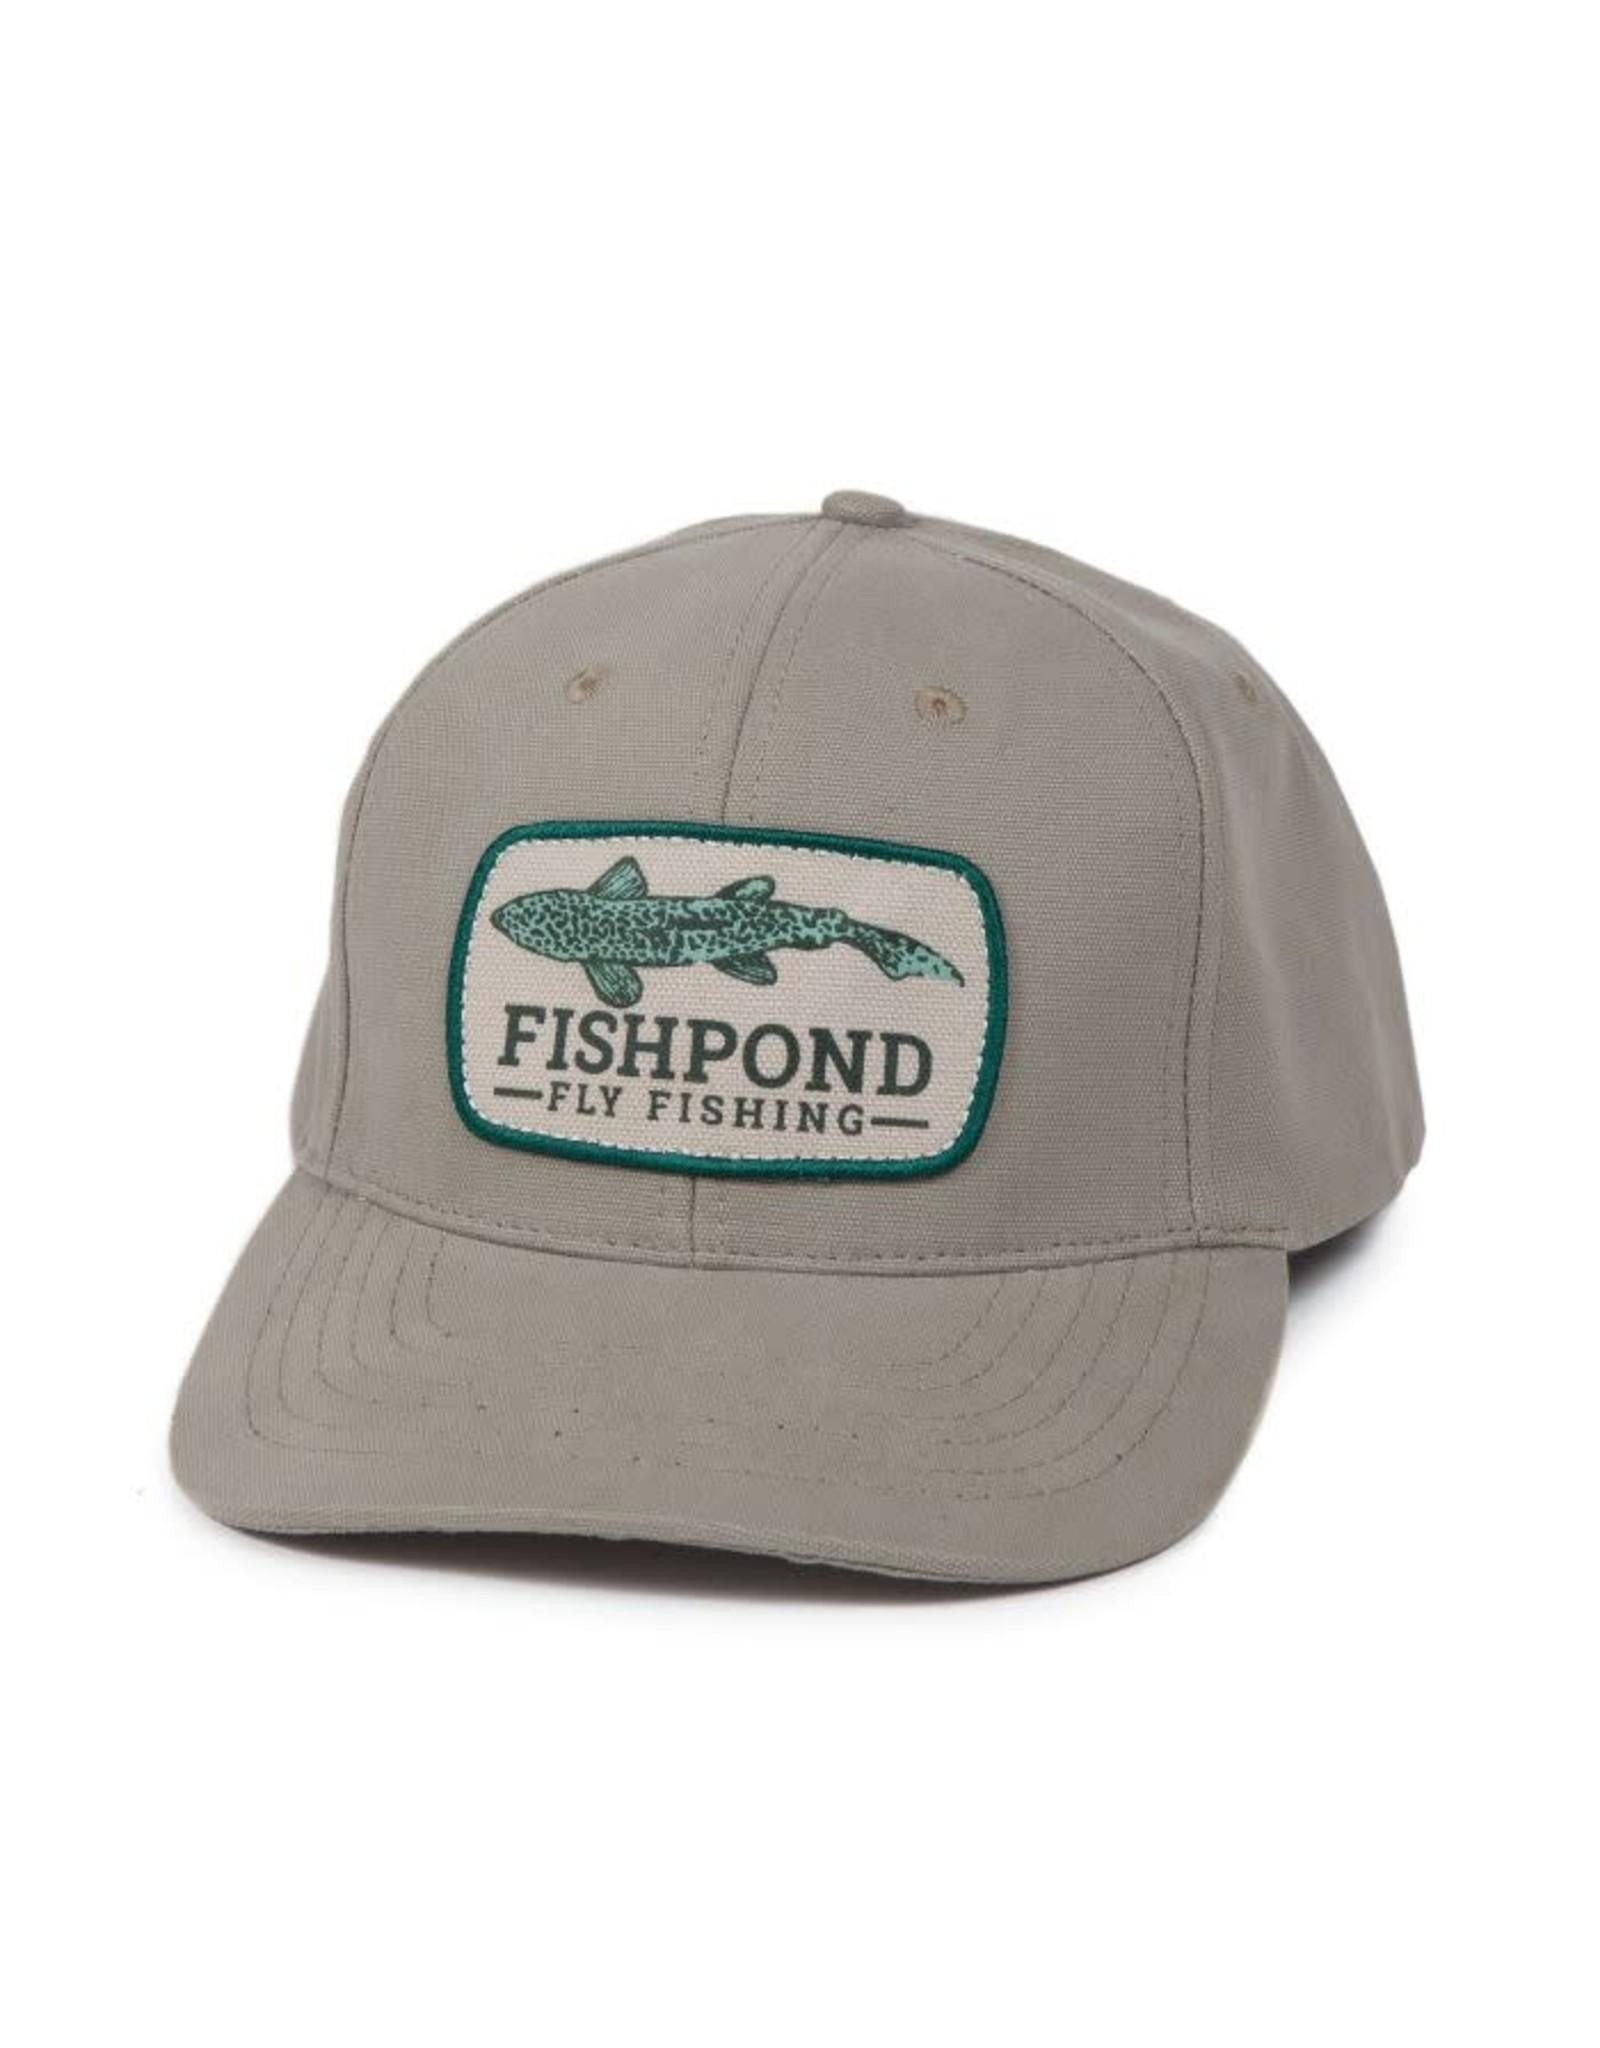 FISHPOND Fishpond Cruiser Trout Hat - Full Back - Chalk Bluff